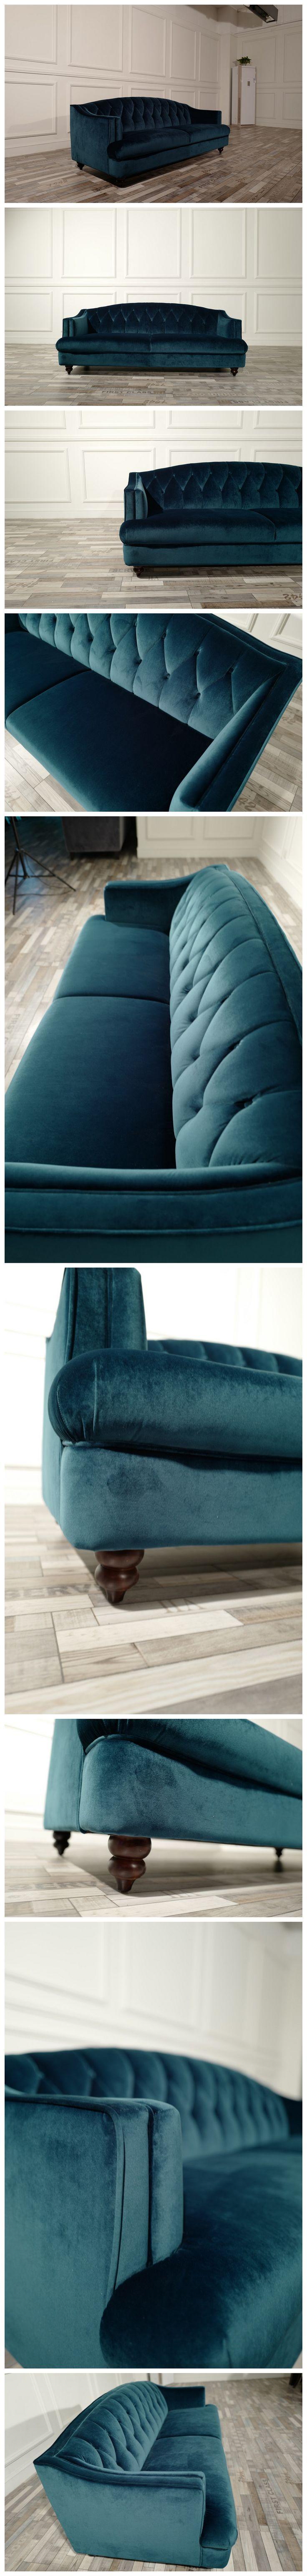 Hot Selling Traditional Teal Blue Velvet Button Tufted Upholstered Settee  new design modern sofa set #sofaset #sofa #cocheen #modernsofa #cocheendesign #livingroomsofa #furniture #newdesign #sectionalsofa #homefurniture #couch #furniturefactory #CIFF #cantonfair  contact:jennifer@cocheen.com  online store link: cocheenfurniture.en.alibaba.com